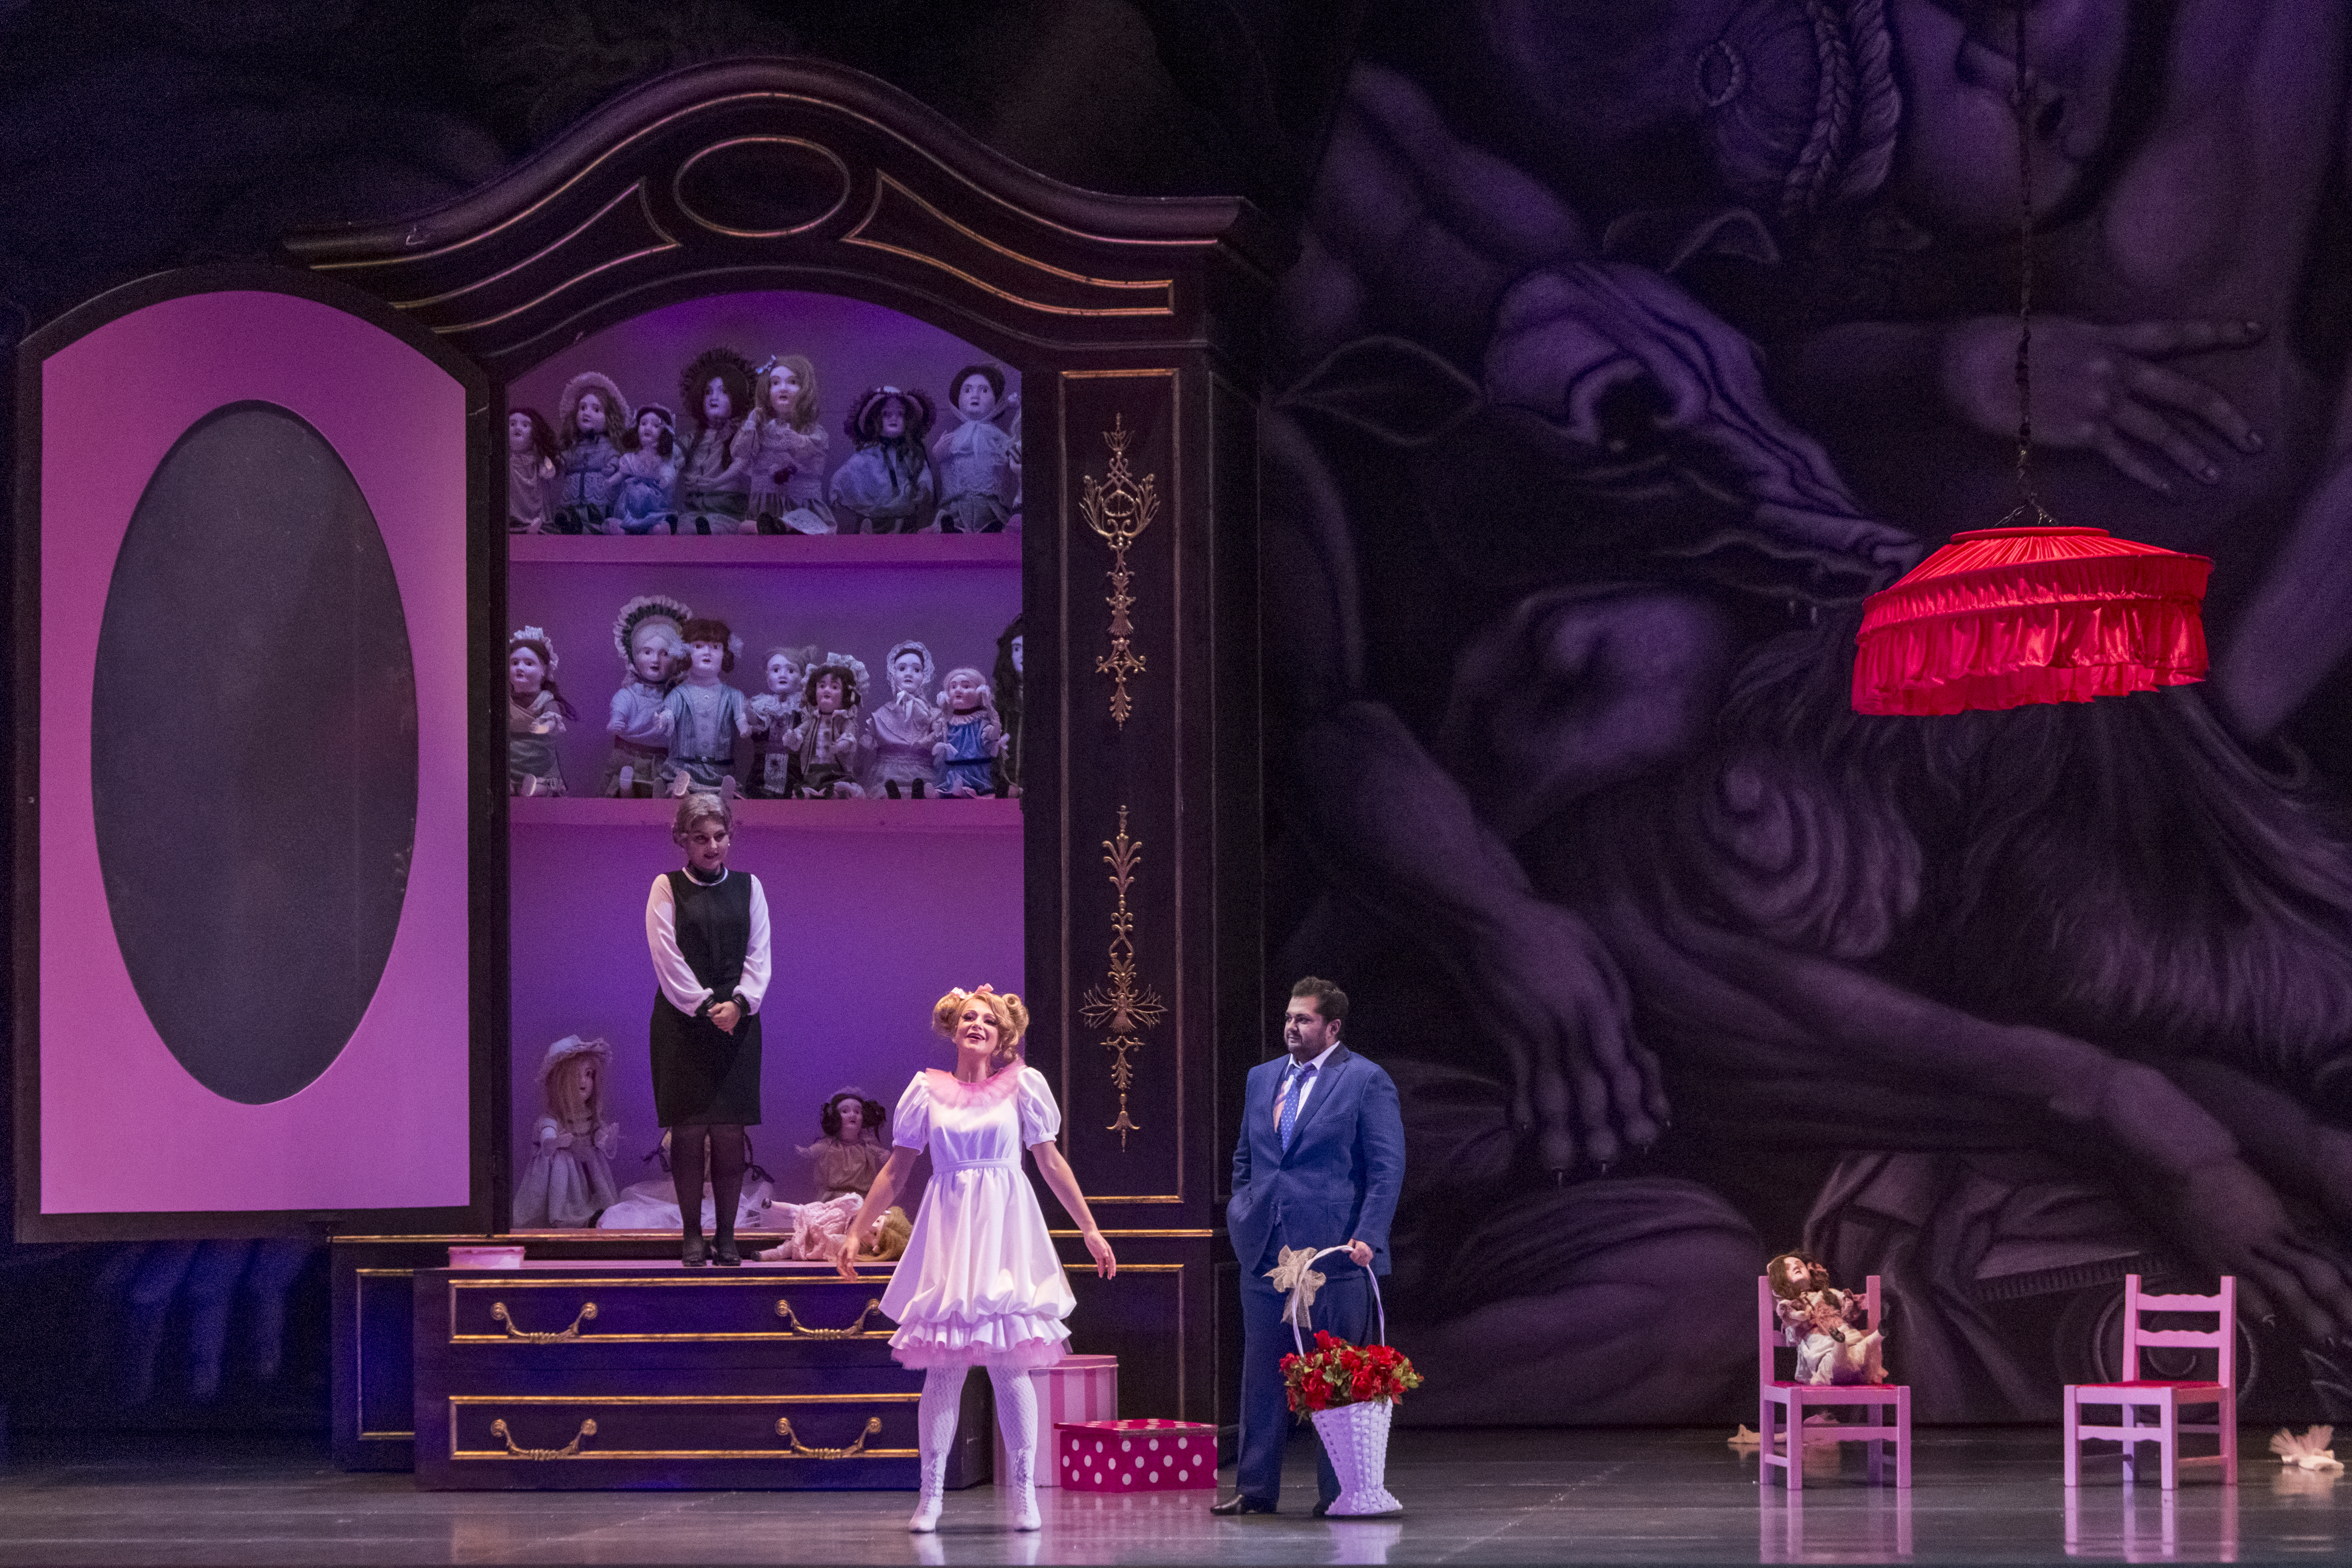 Rigoletto en el Comunale di Bolonia. Foto: Rocco Casaluci